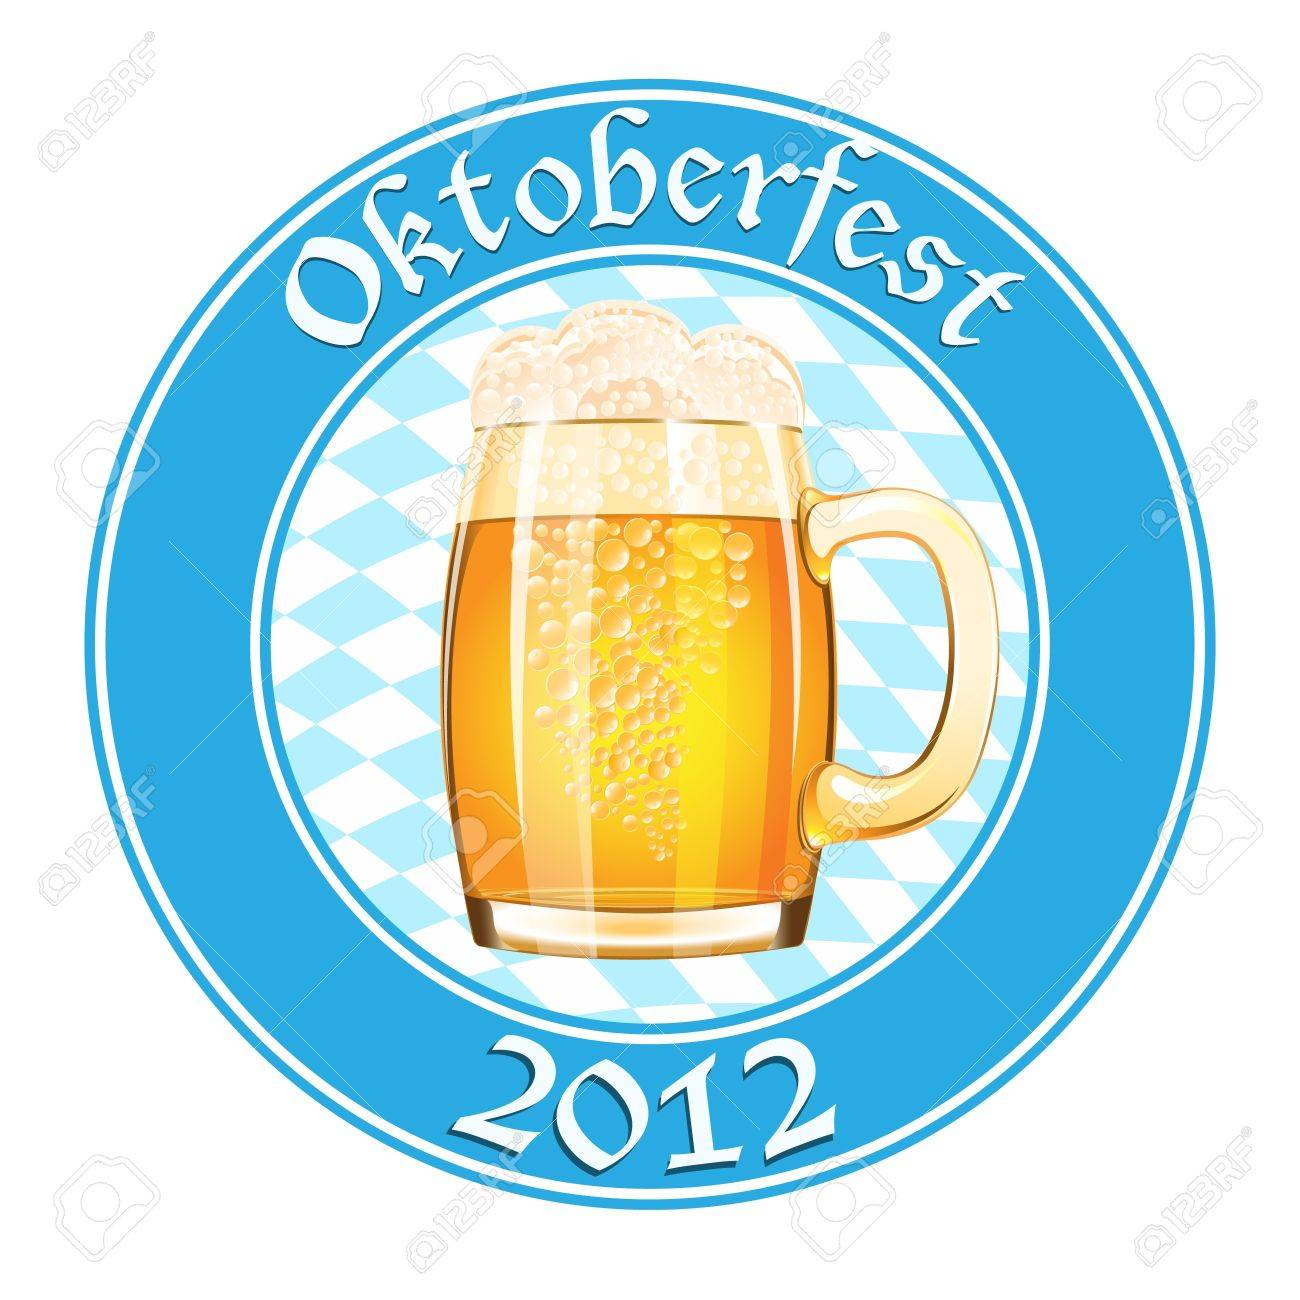 Oktoberfest banner with beer mug Stock Vector - 14794273